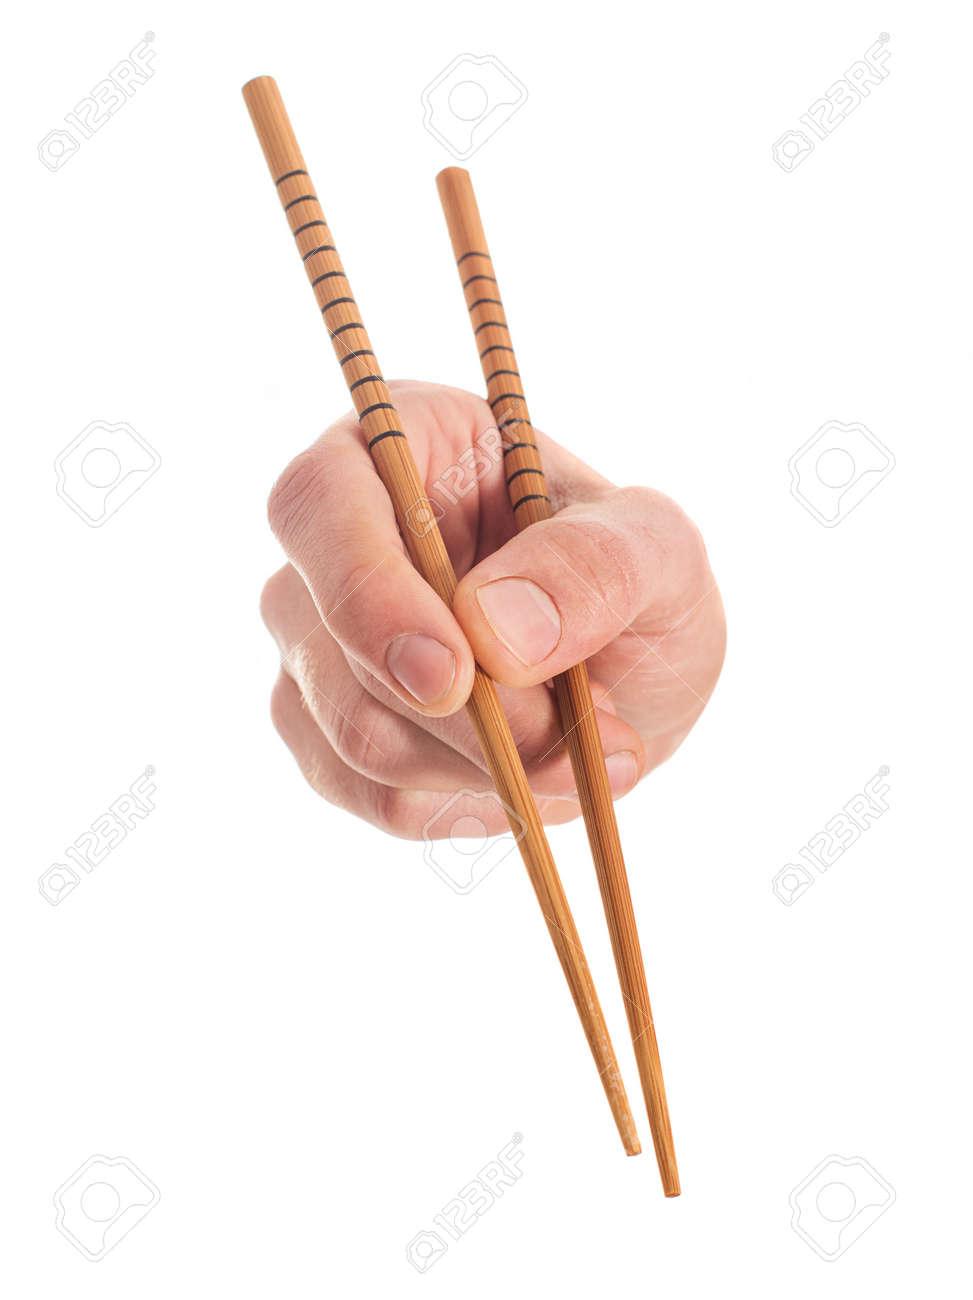 Close-up Of Hand Holding Chopsticks On White Background - 22036816